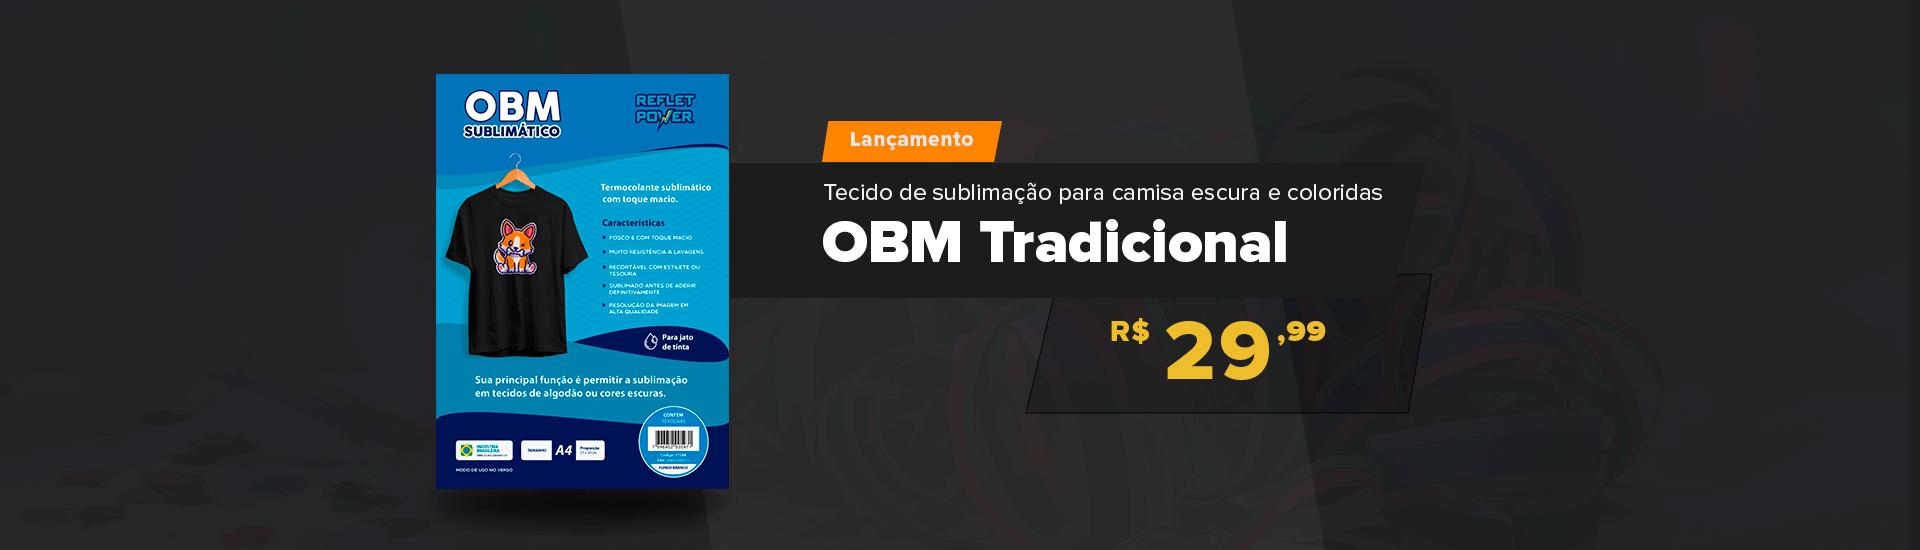 OBM Tradicional